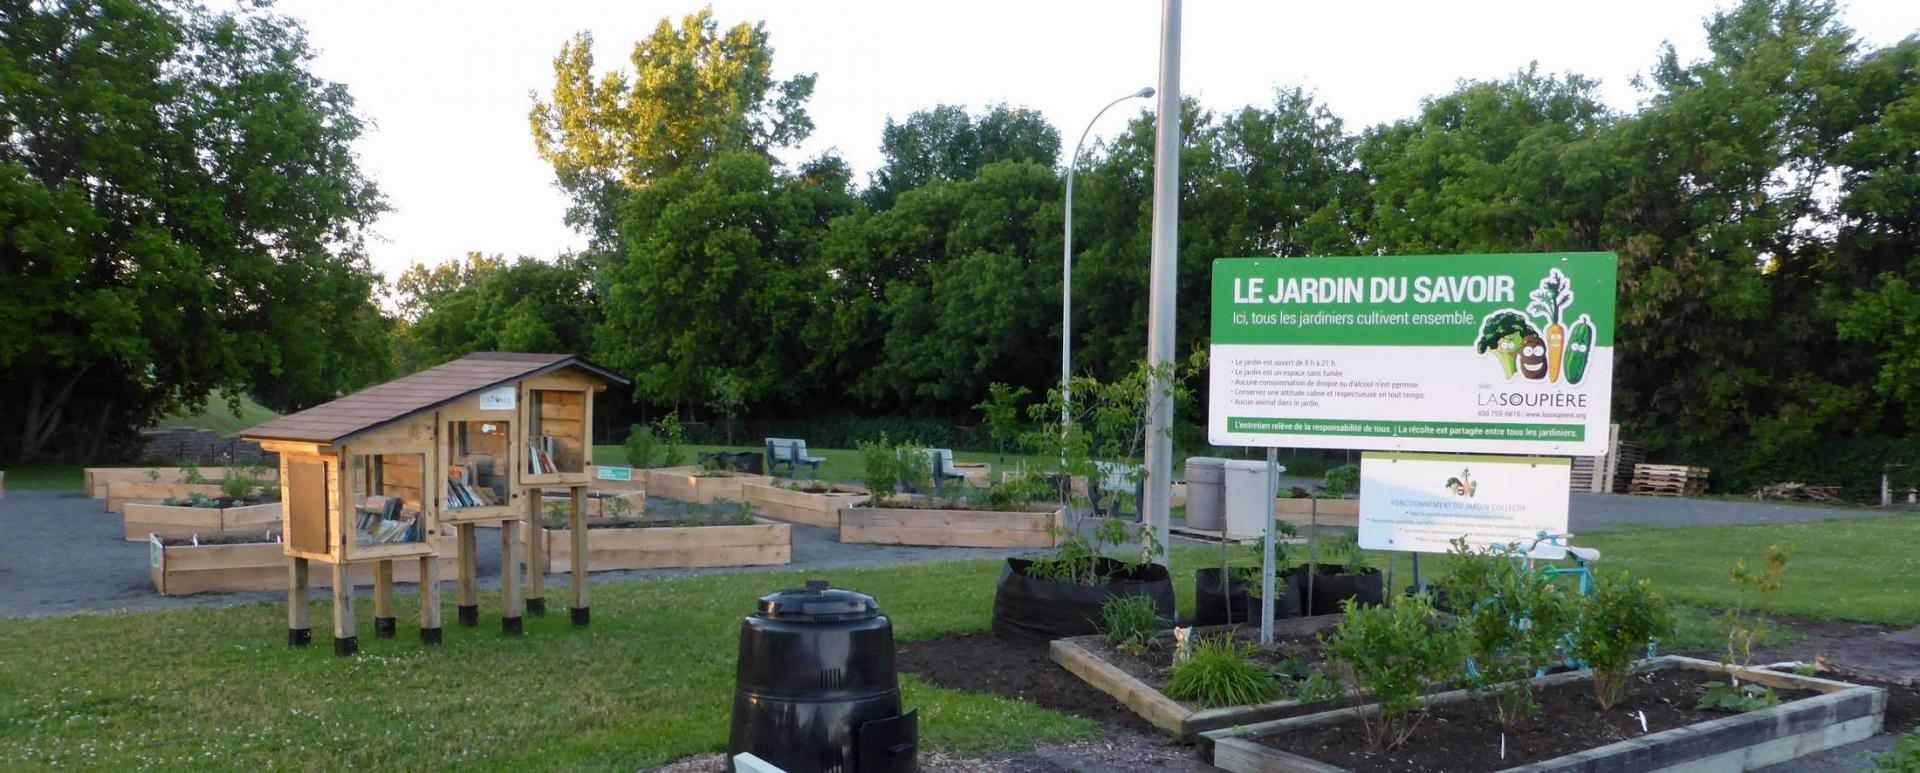 Jardins du Savoir, rue Monseigneur-Forbes, Joliette